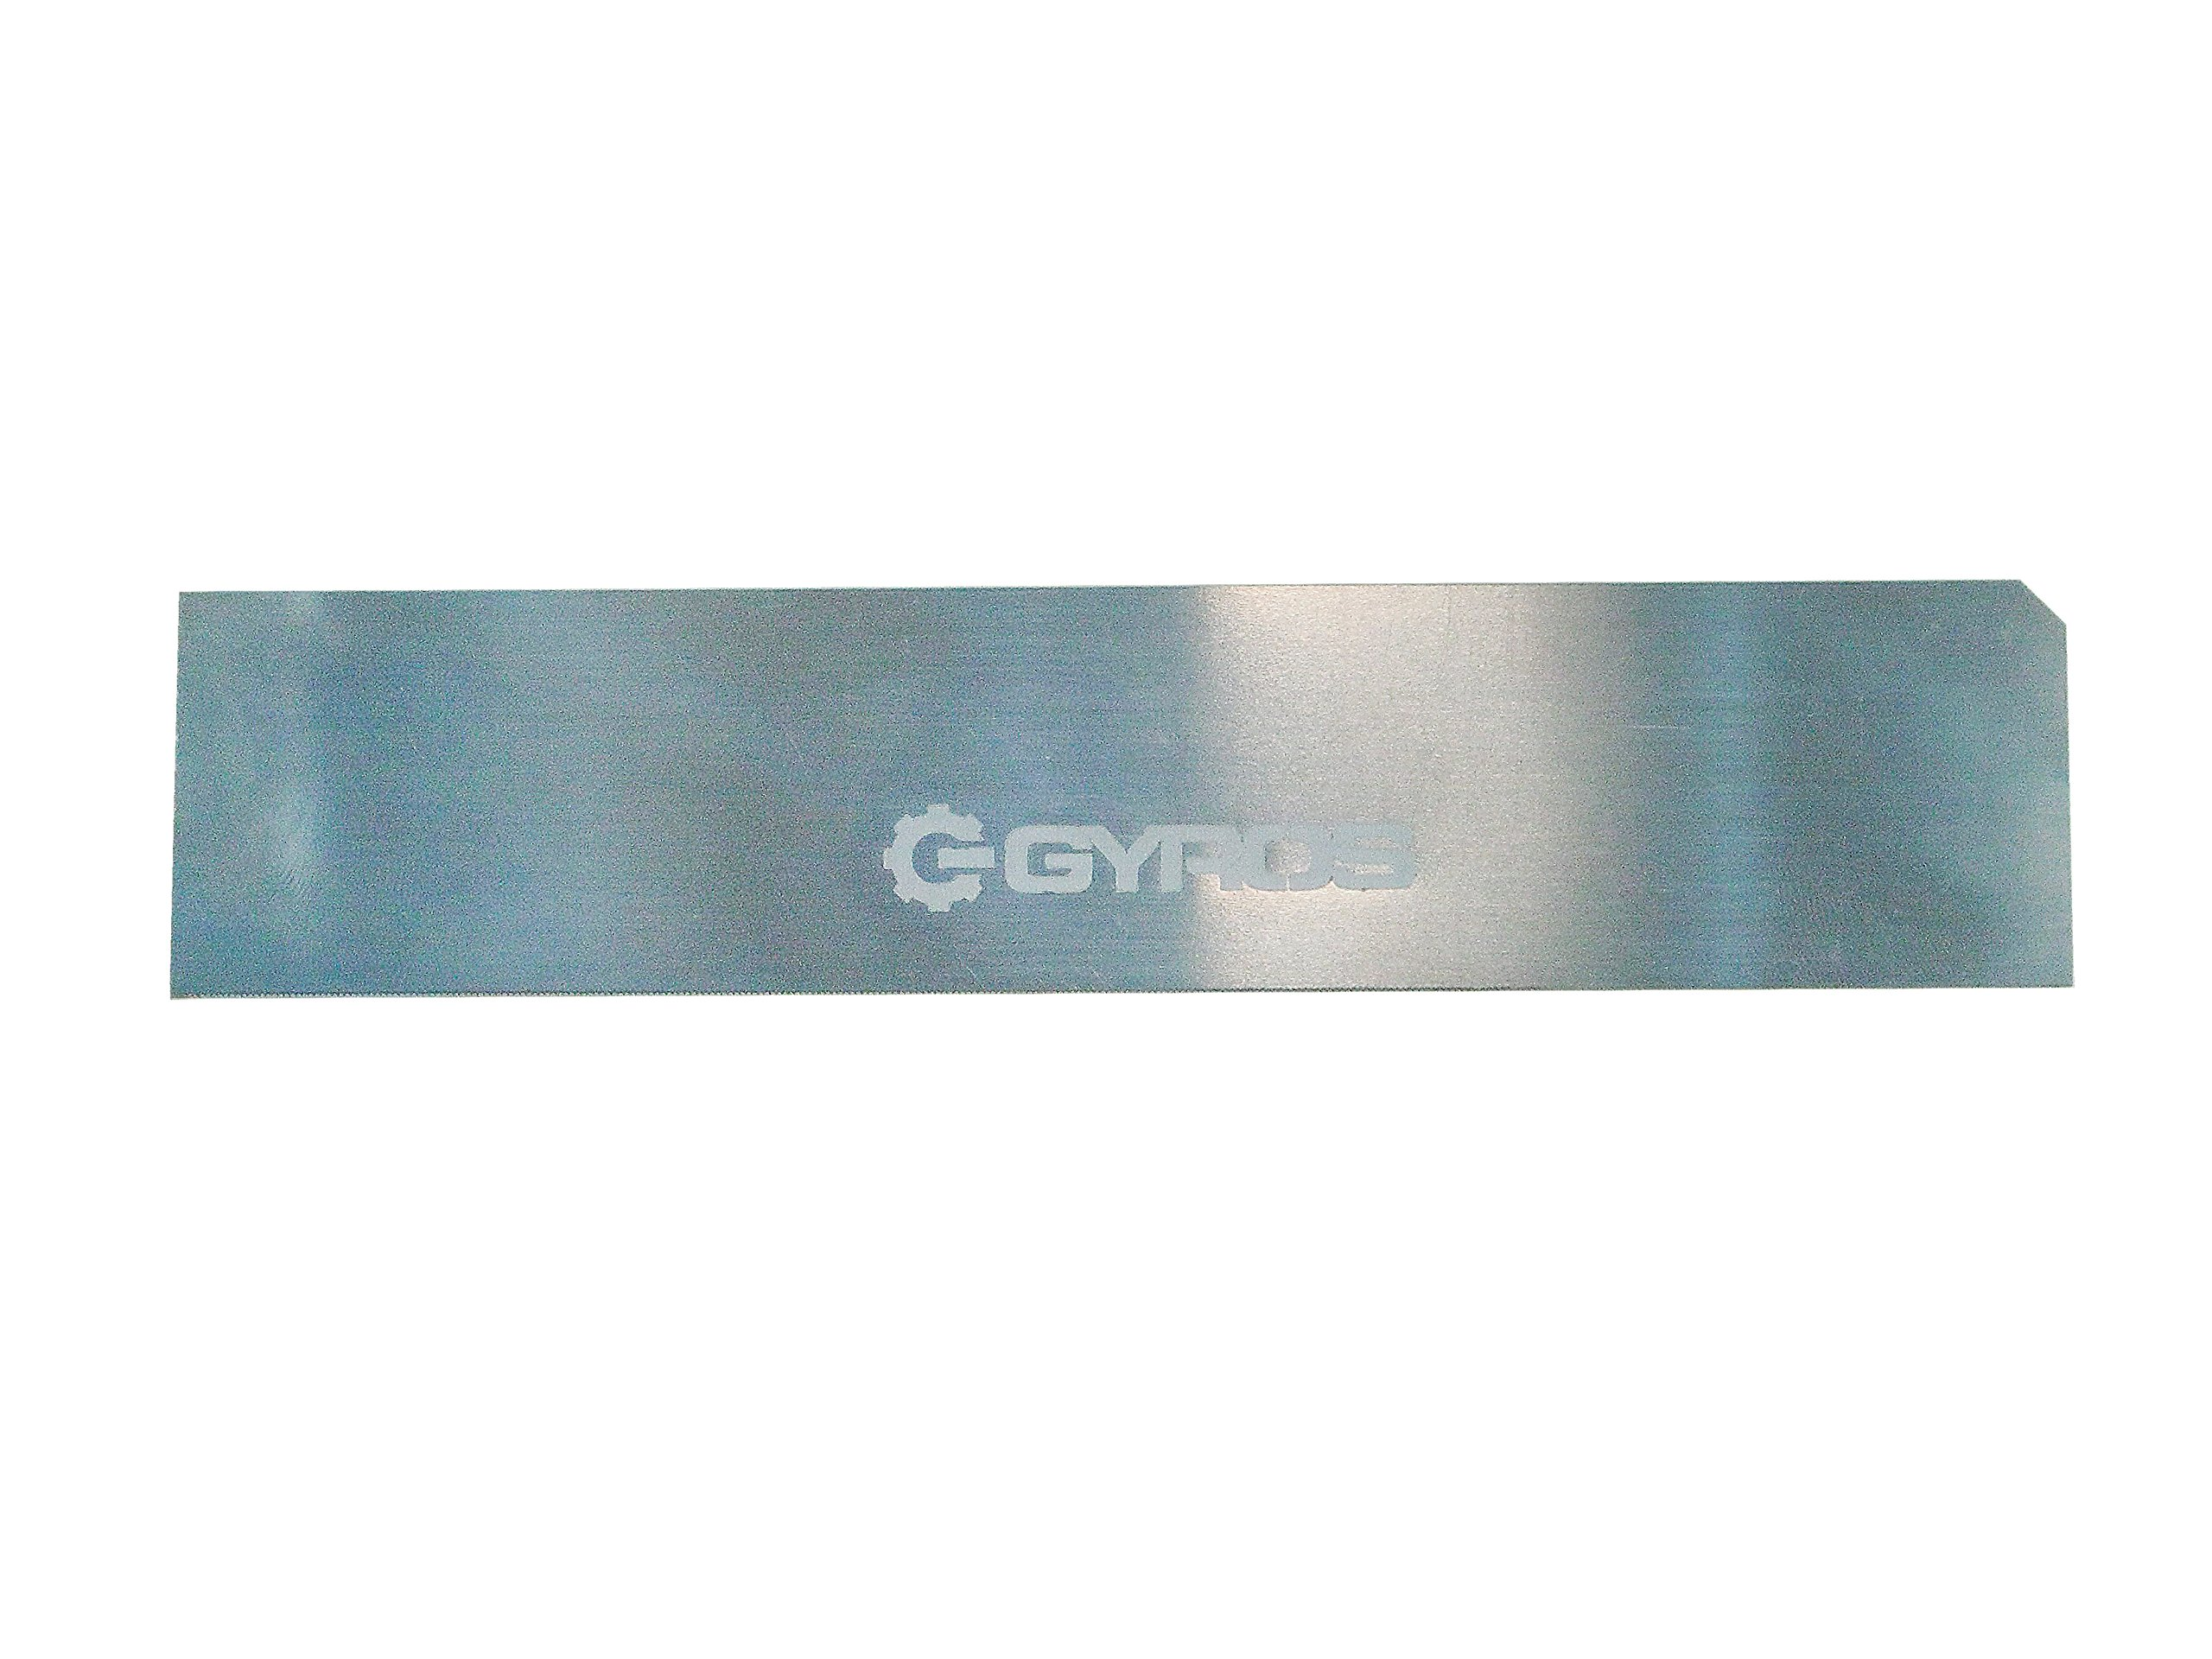 Gyros 84-16008 Razor Saw Replacement Blade by Gyros